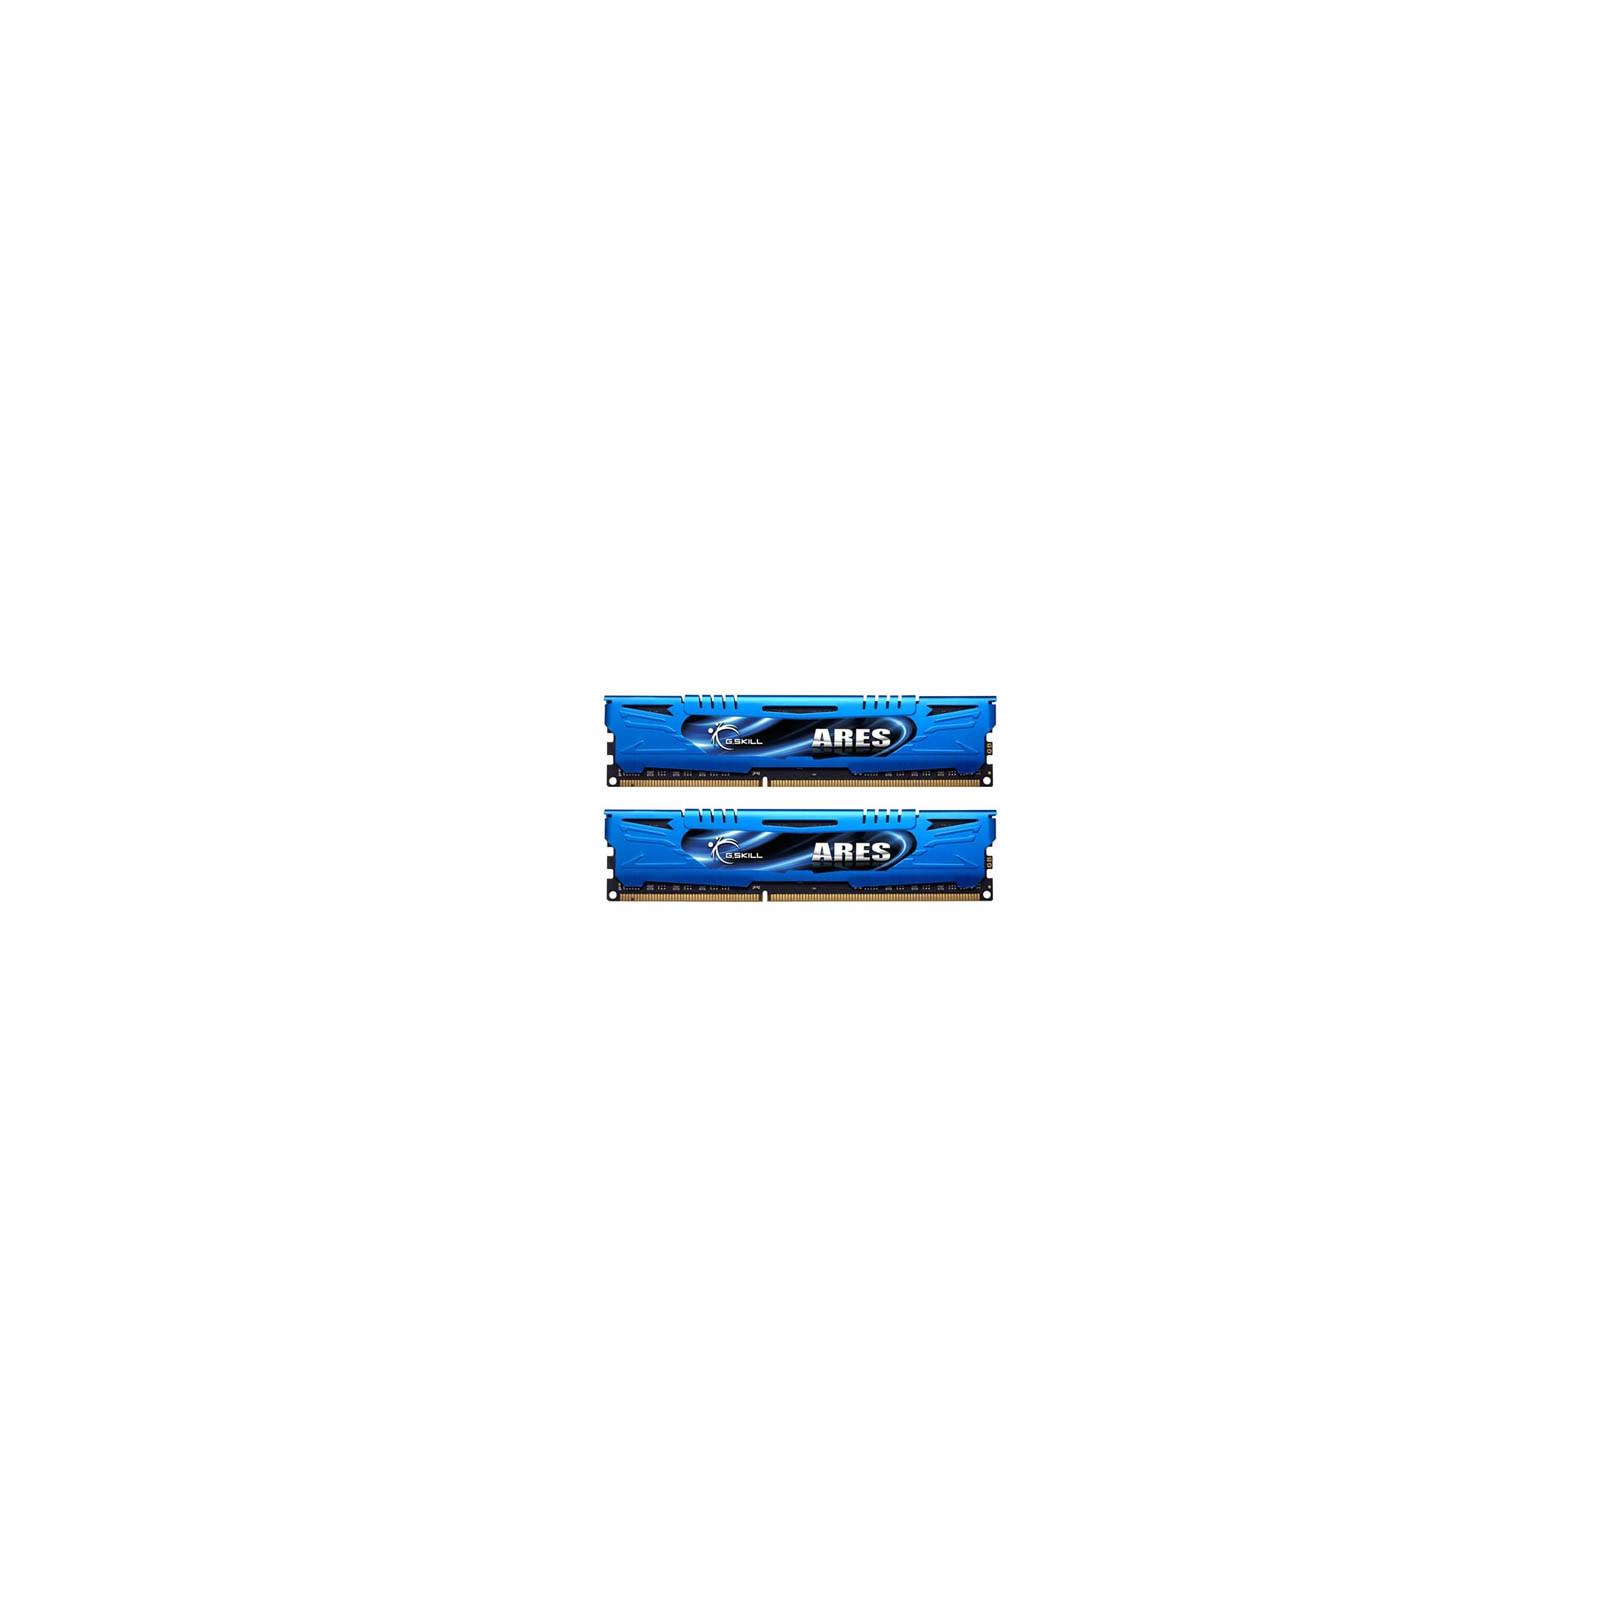 Модуль памяти для компьютера DDR3 8GB (2x4GB) 2133 MHz G.Skill (F3-2133C9D-8GAB)